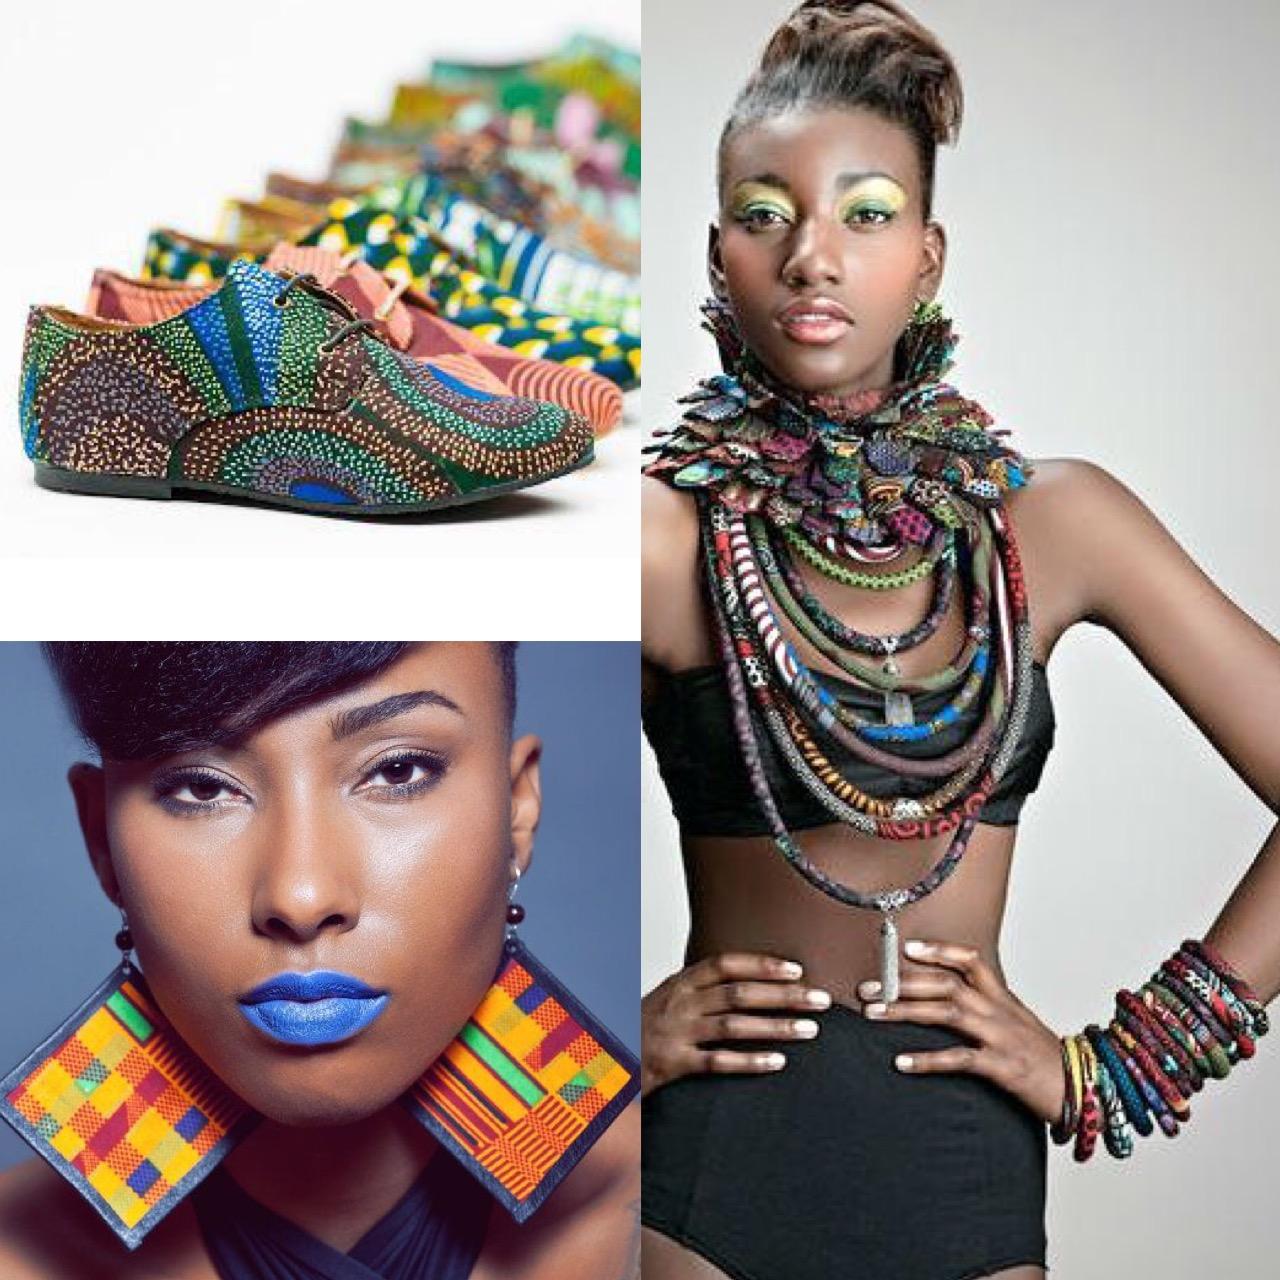 summer 2015 fashion must haves ladies life style by matsela moshokoa. Black Bedroom Furniture Sets. Home Design Ideas